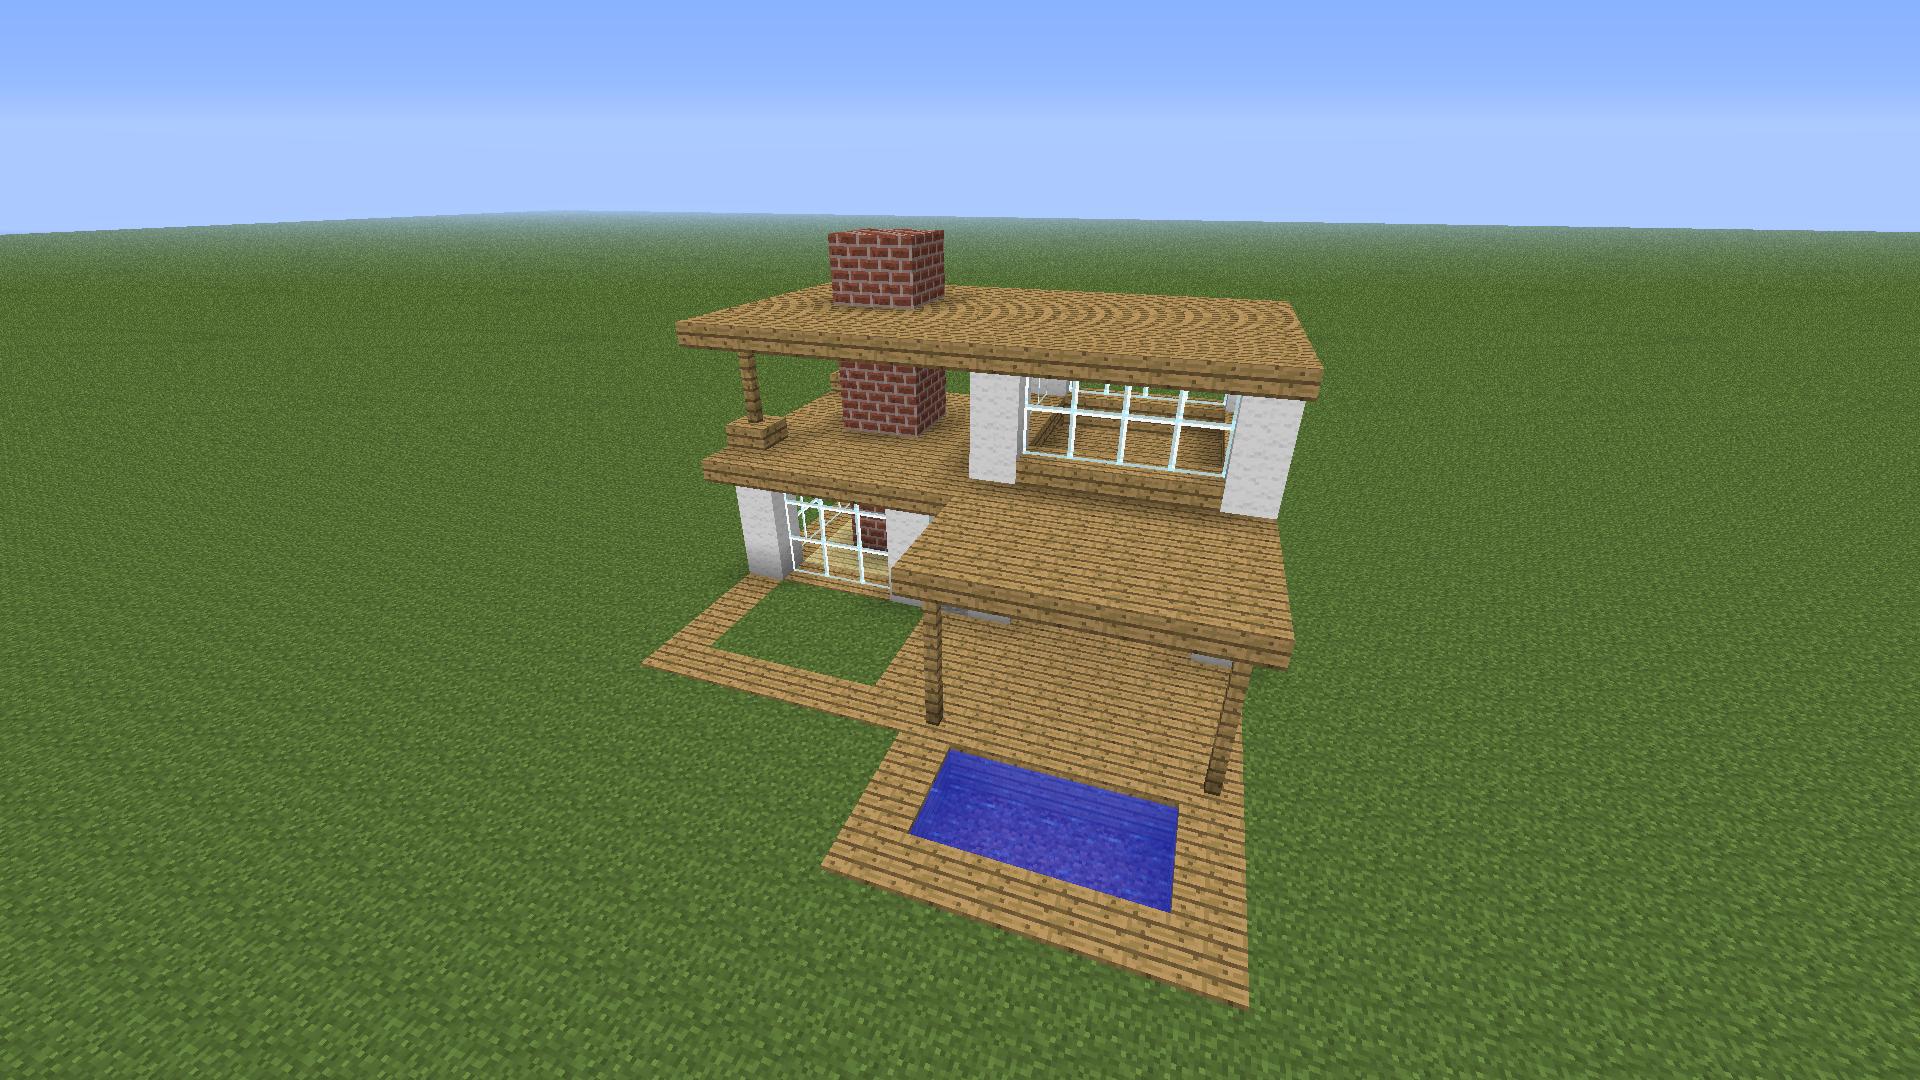 minecraft house tutorial - HD1899×1068